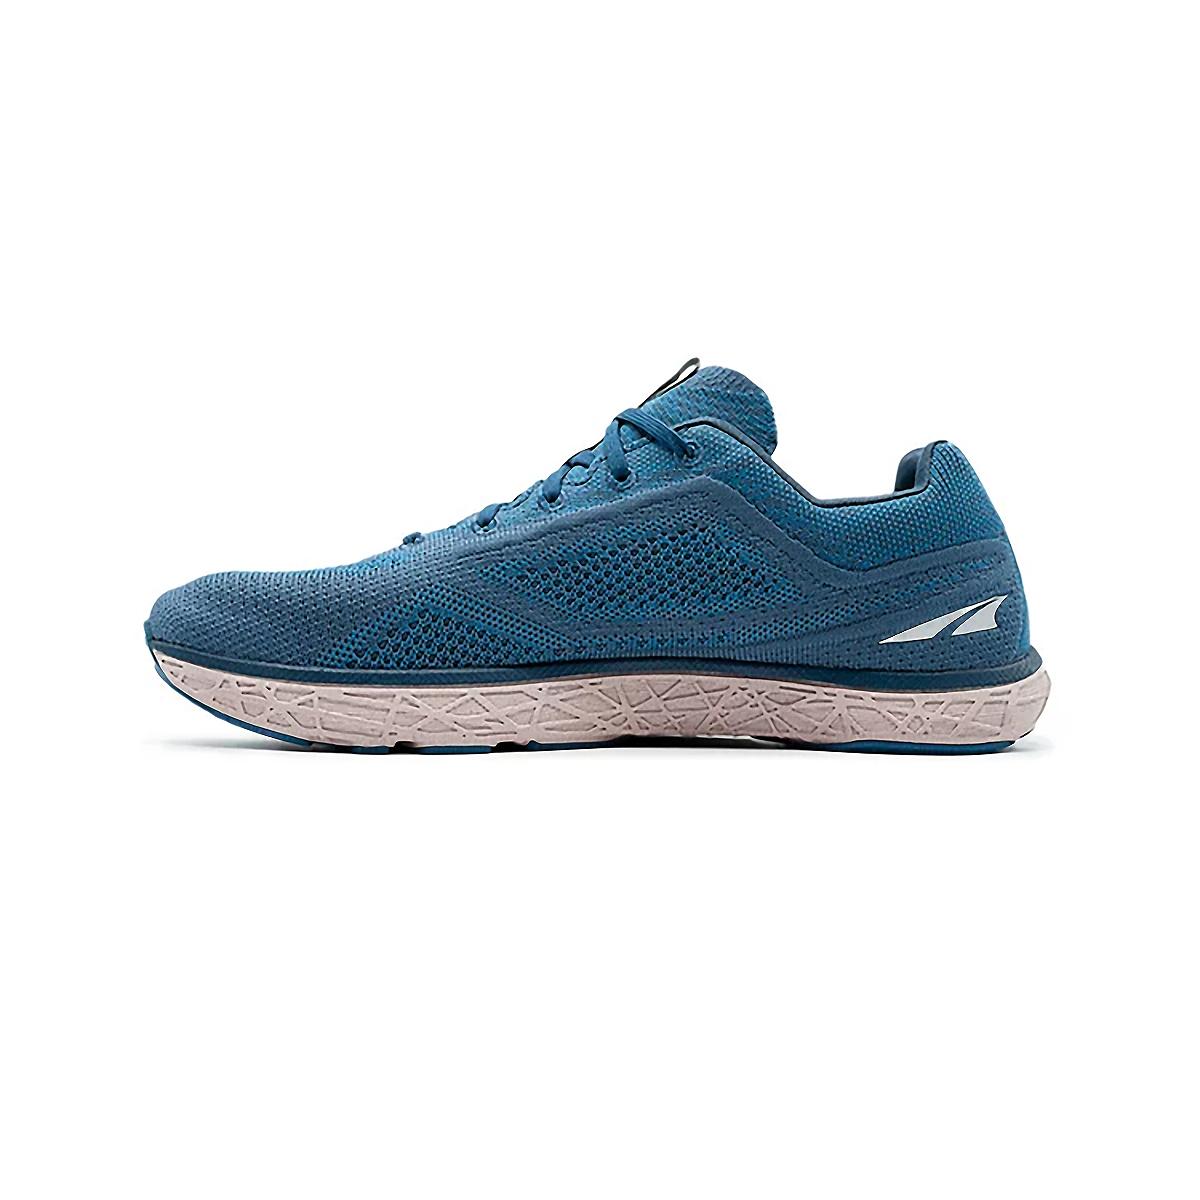 Men's Altra Escalante 2.5 Running Shoe - Color: Majolica Blue - Size: 7 - Width: Regular, Majolica Blue, large, image 2